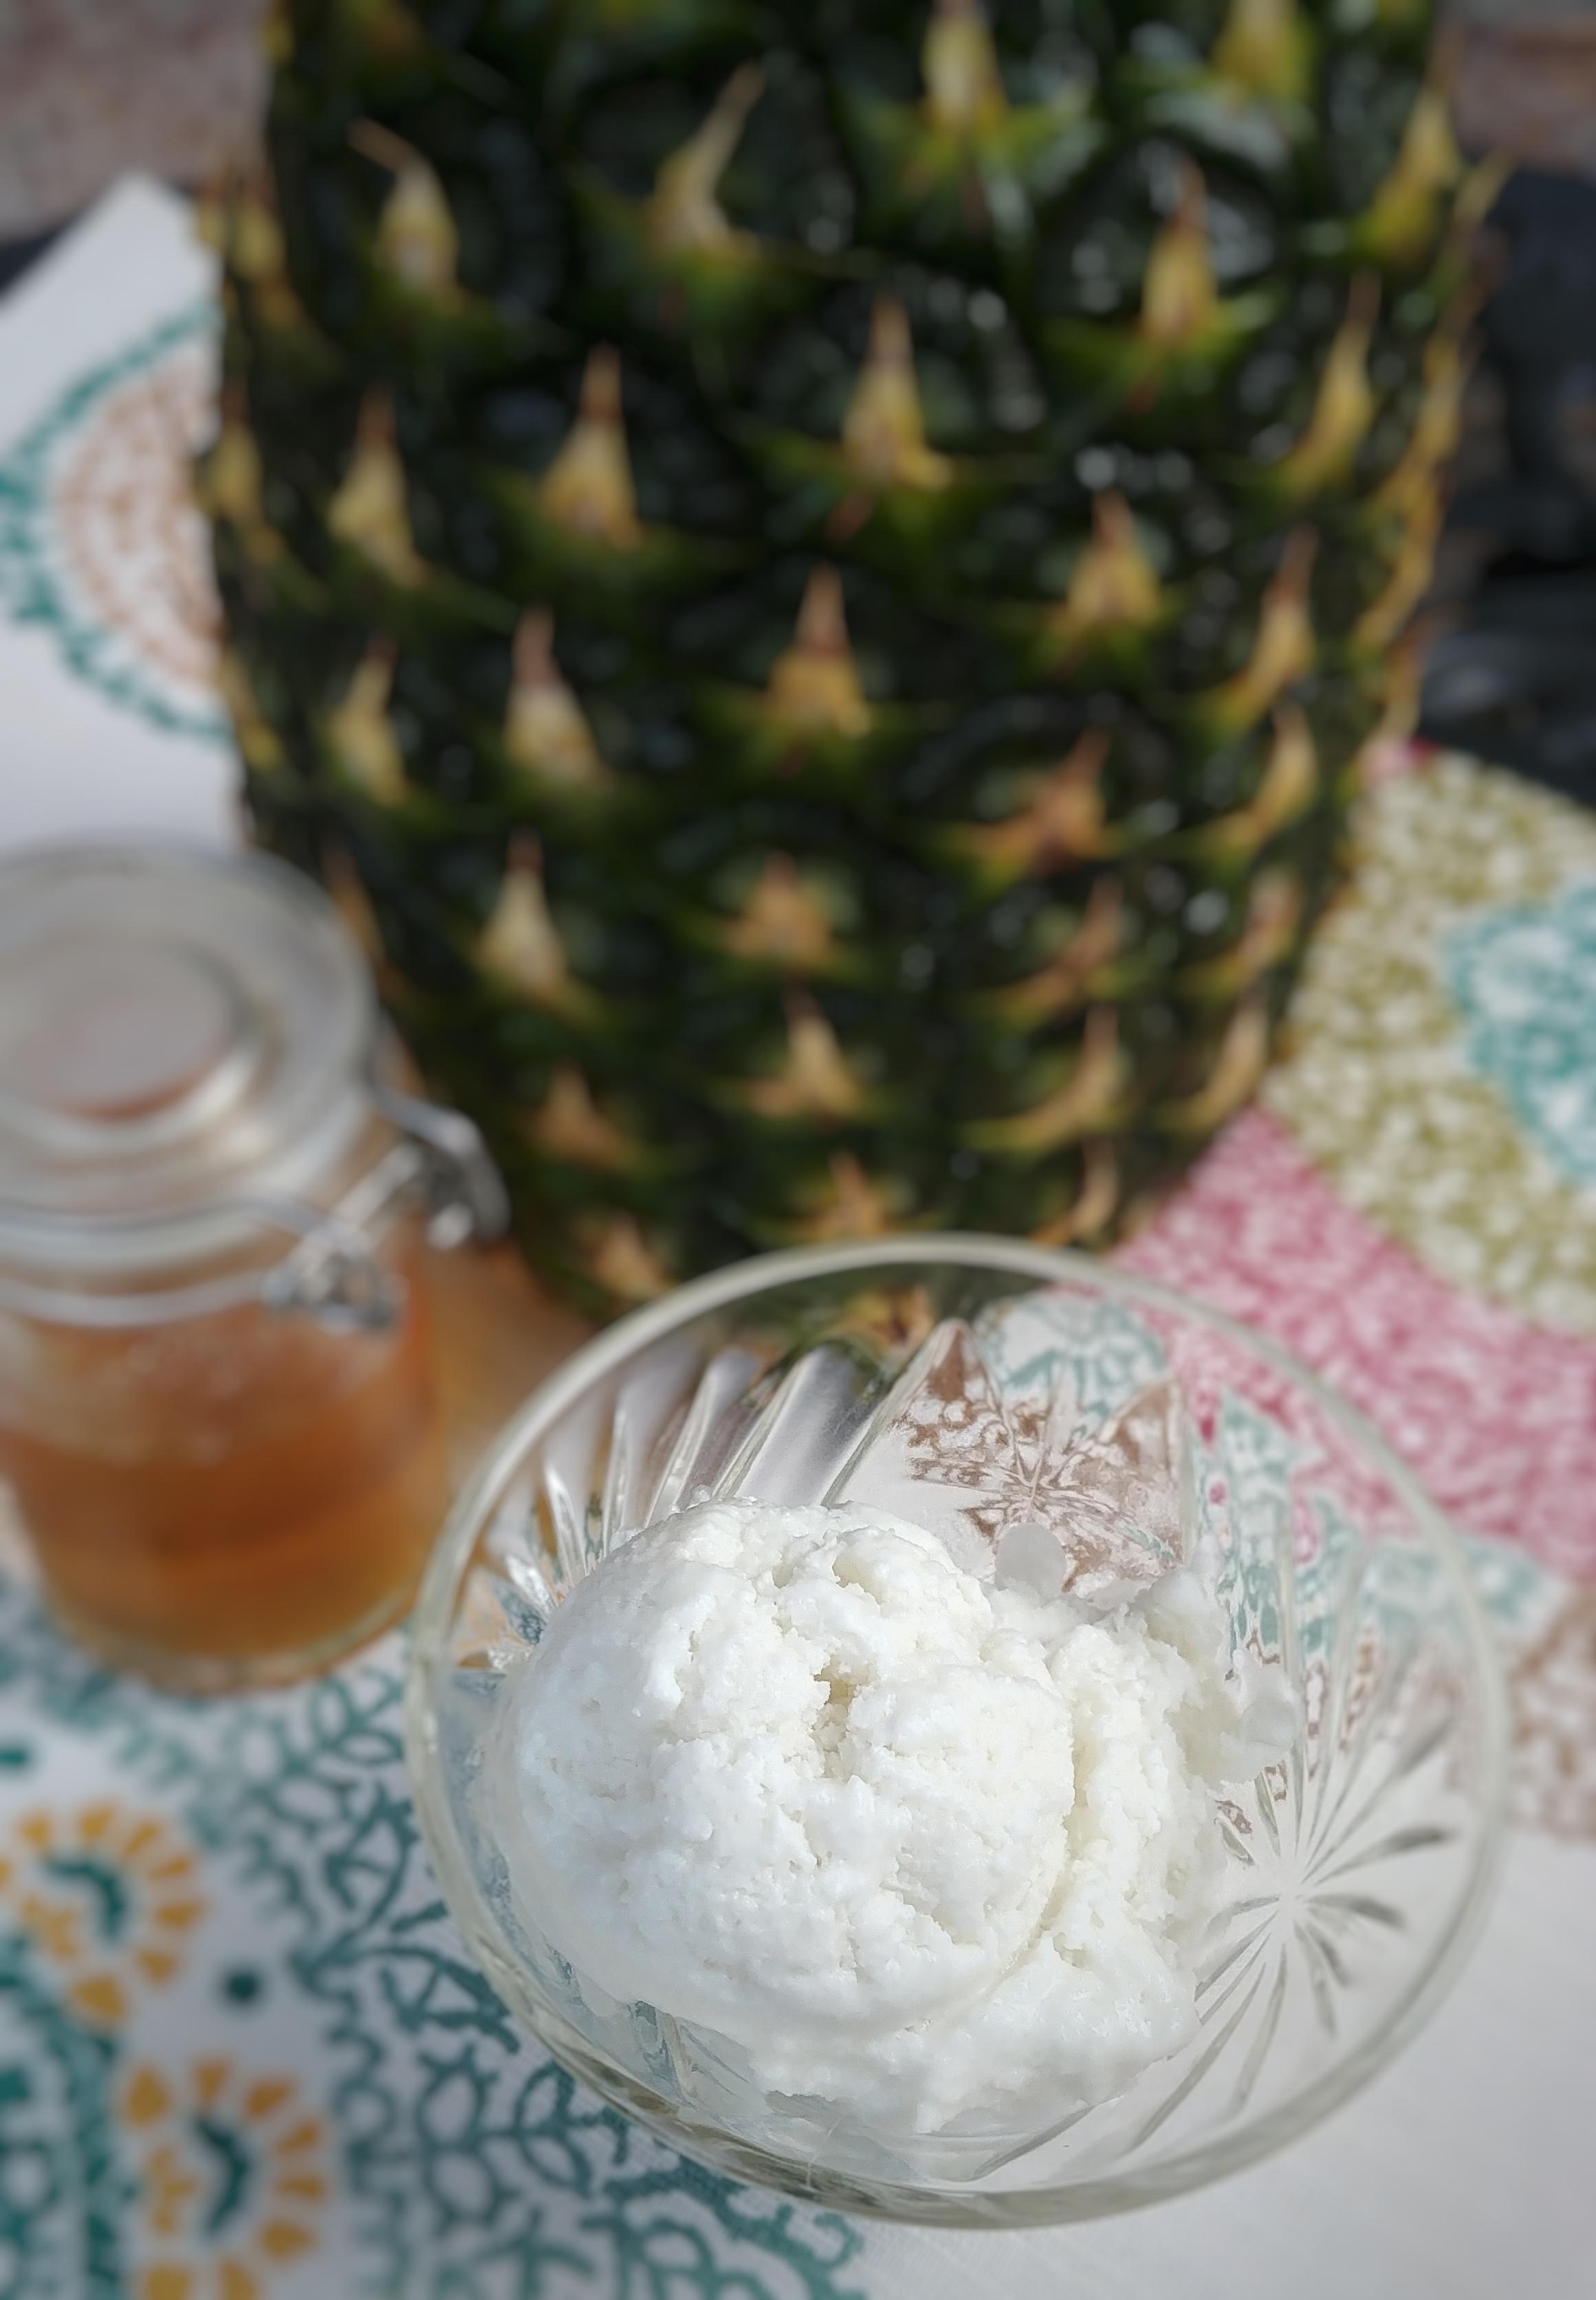 Leftover Coconut Milk Ice Cream